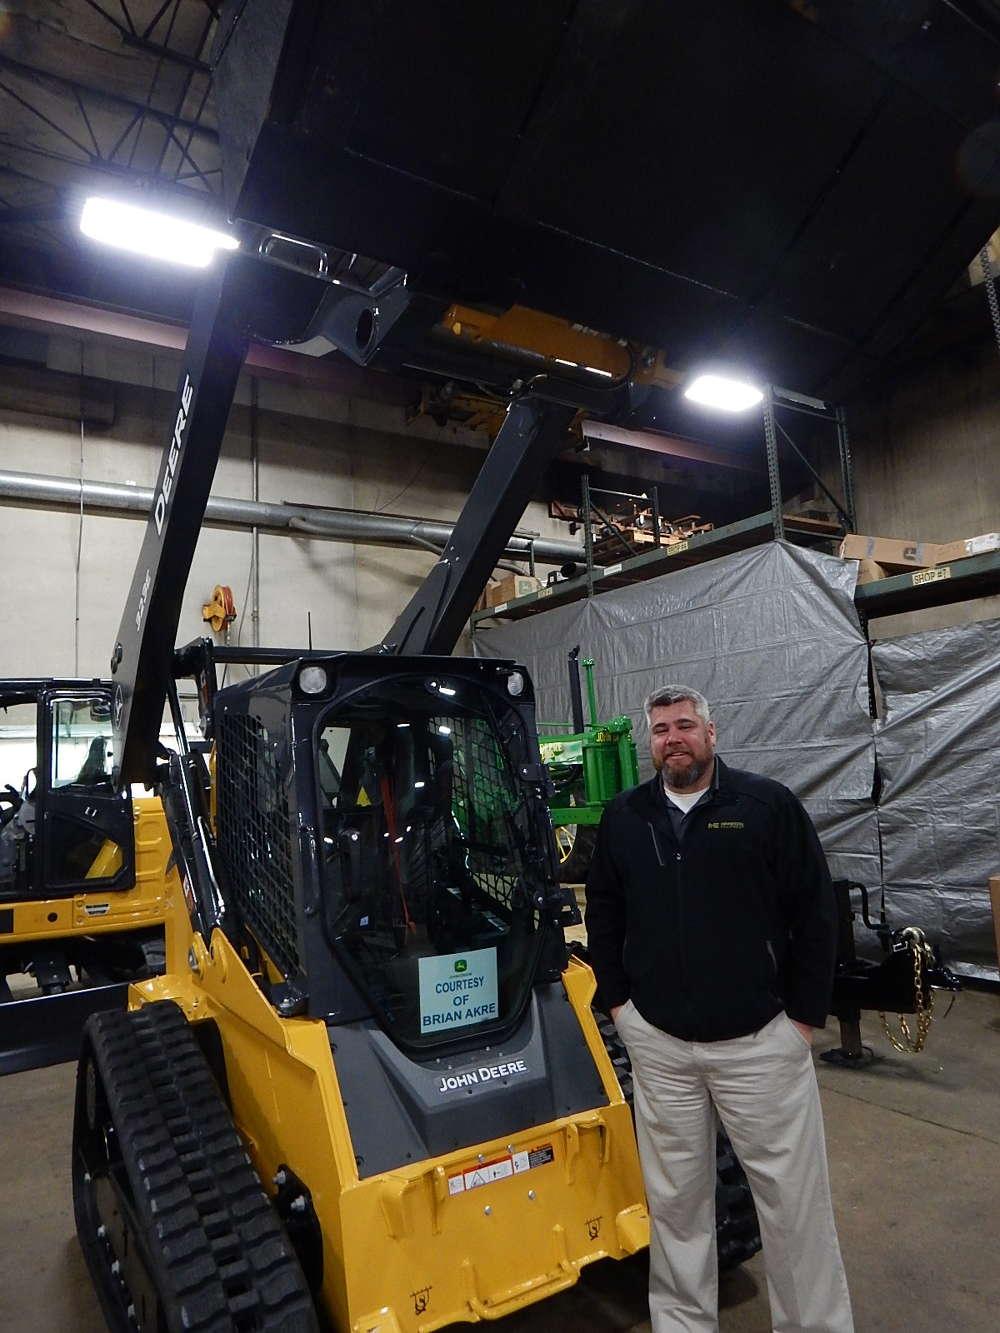 Kevin Knauss, commercial sales of Minnesota  Equipment, Rogers, Minn., stands with a John Deere 323E track machine courtesy of Brian Akre, Zimmerman, Minn.